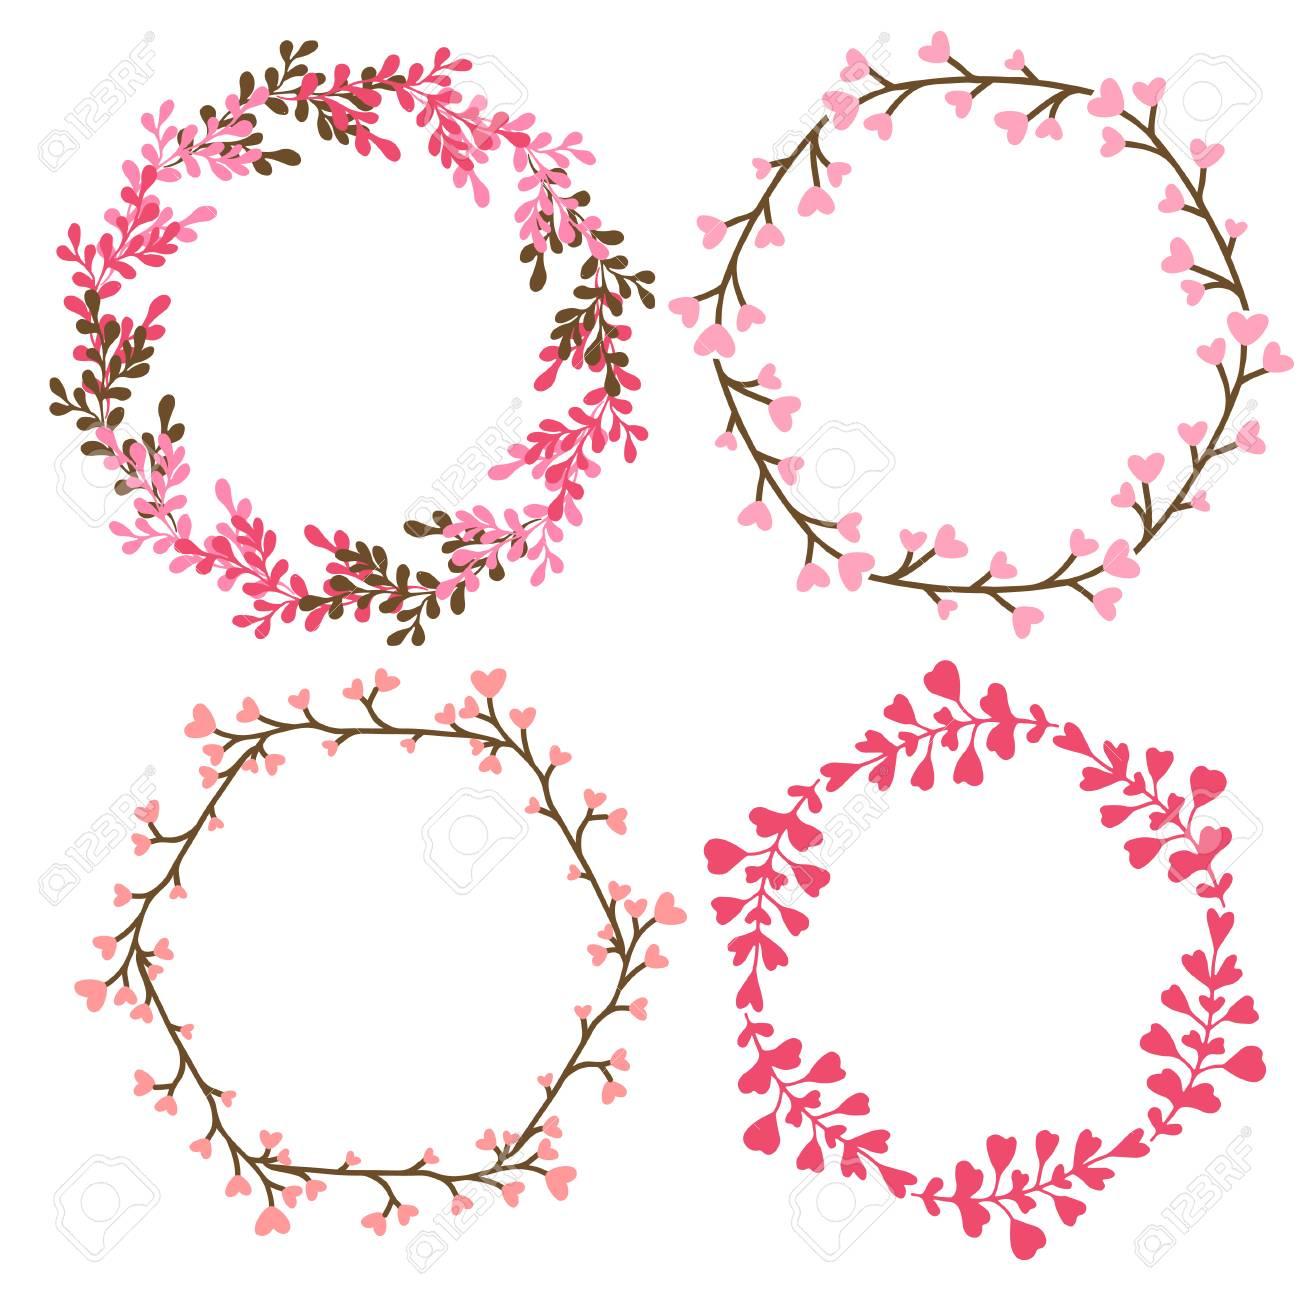 Floral frames decoration vector decorative elements in pink floral frames decoration vector decorative elements in pink color can use for birthday card junglespirit Image collections